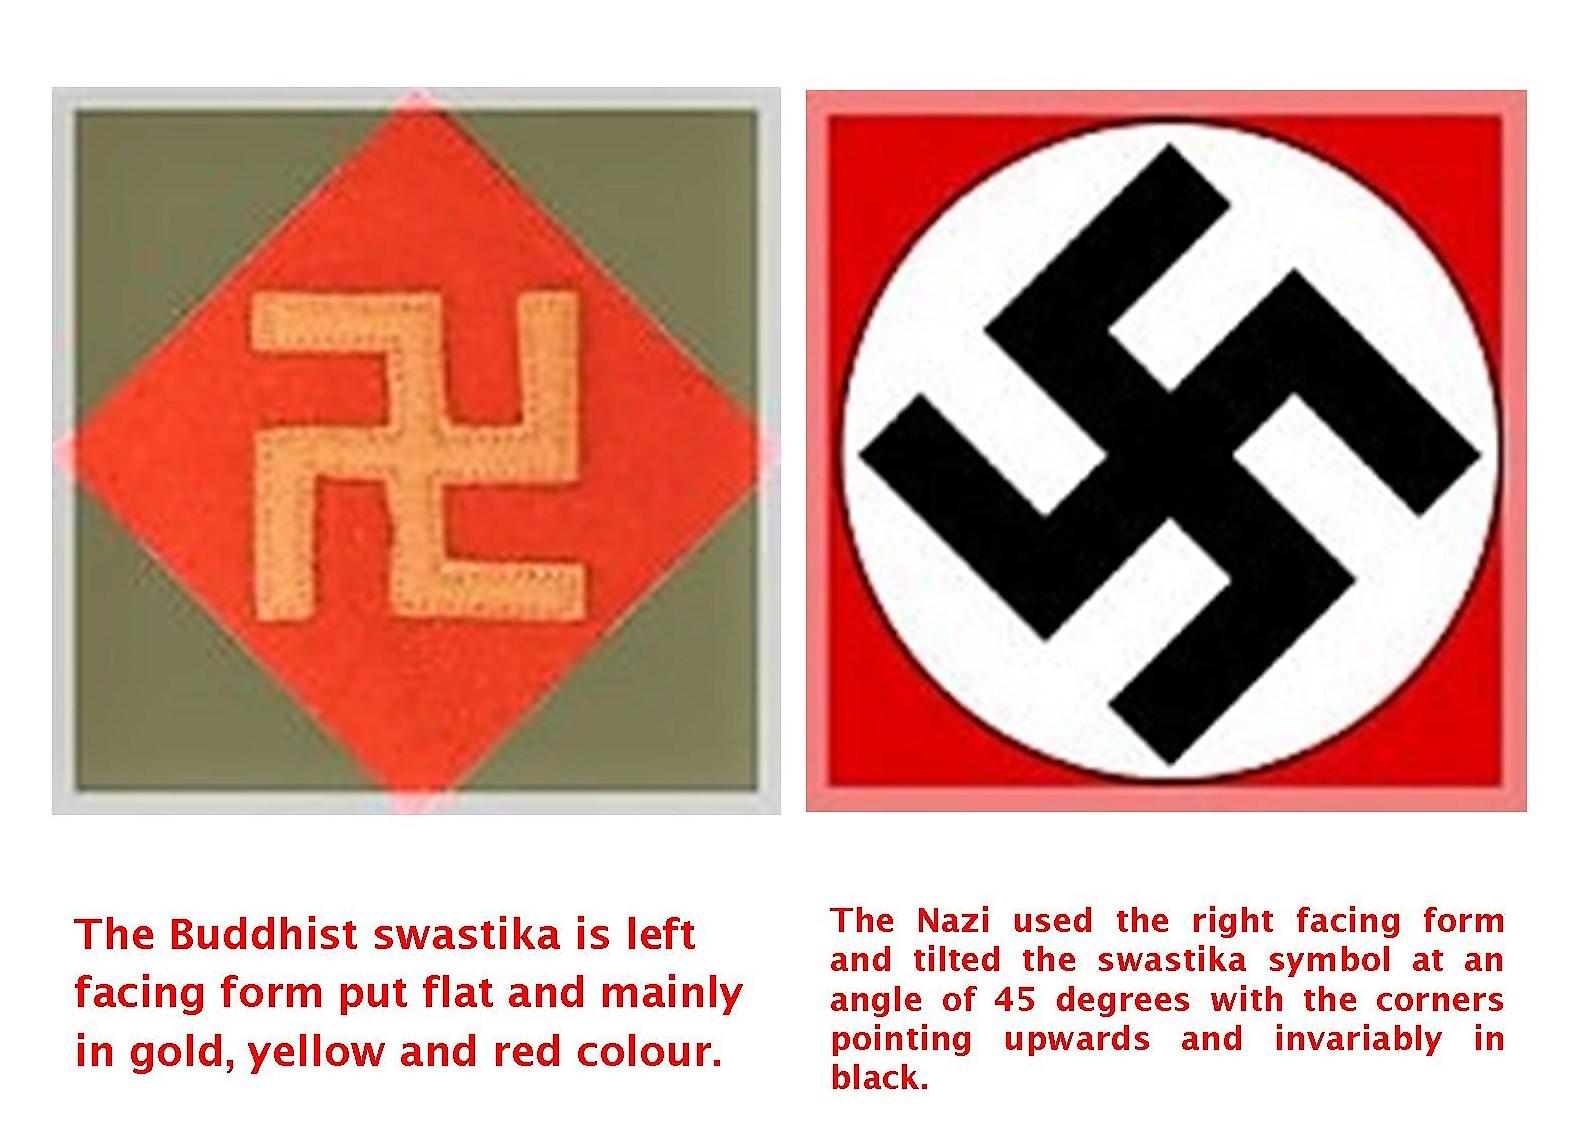 Buddhist and nazi sawtiska symbol buddhism and daily living buddhist and nazi sawtiska symbol biocorpaavc Images